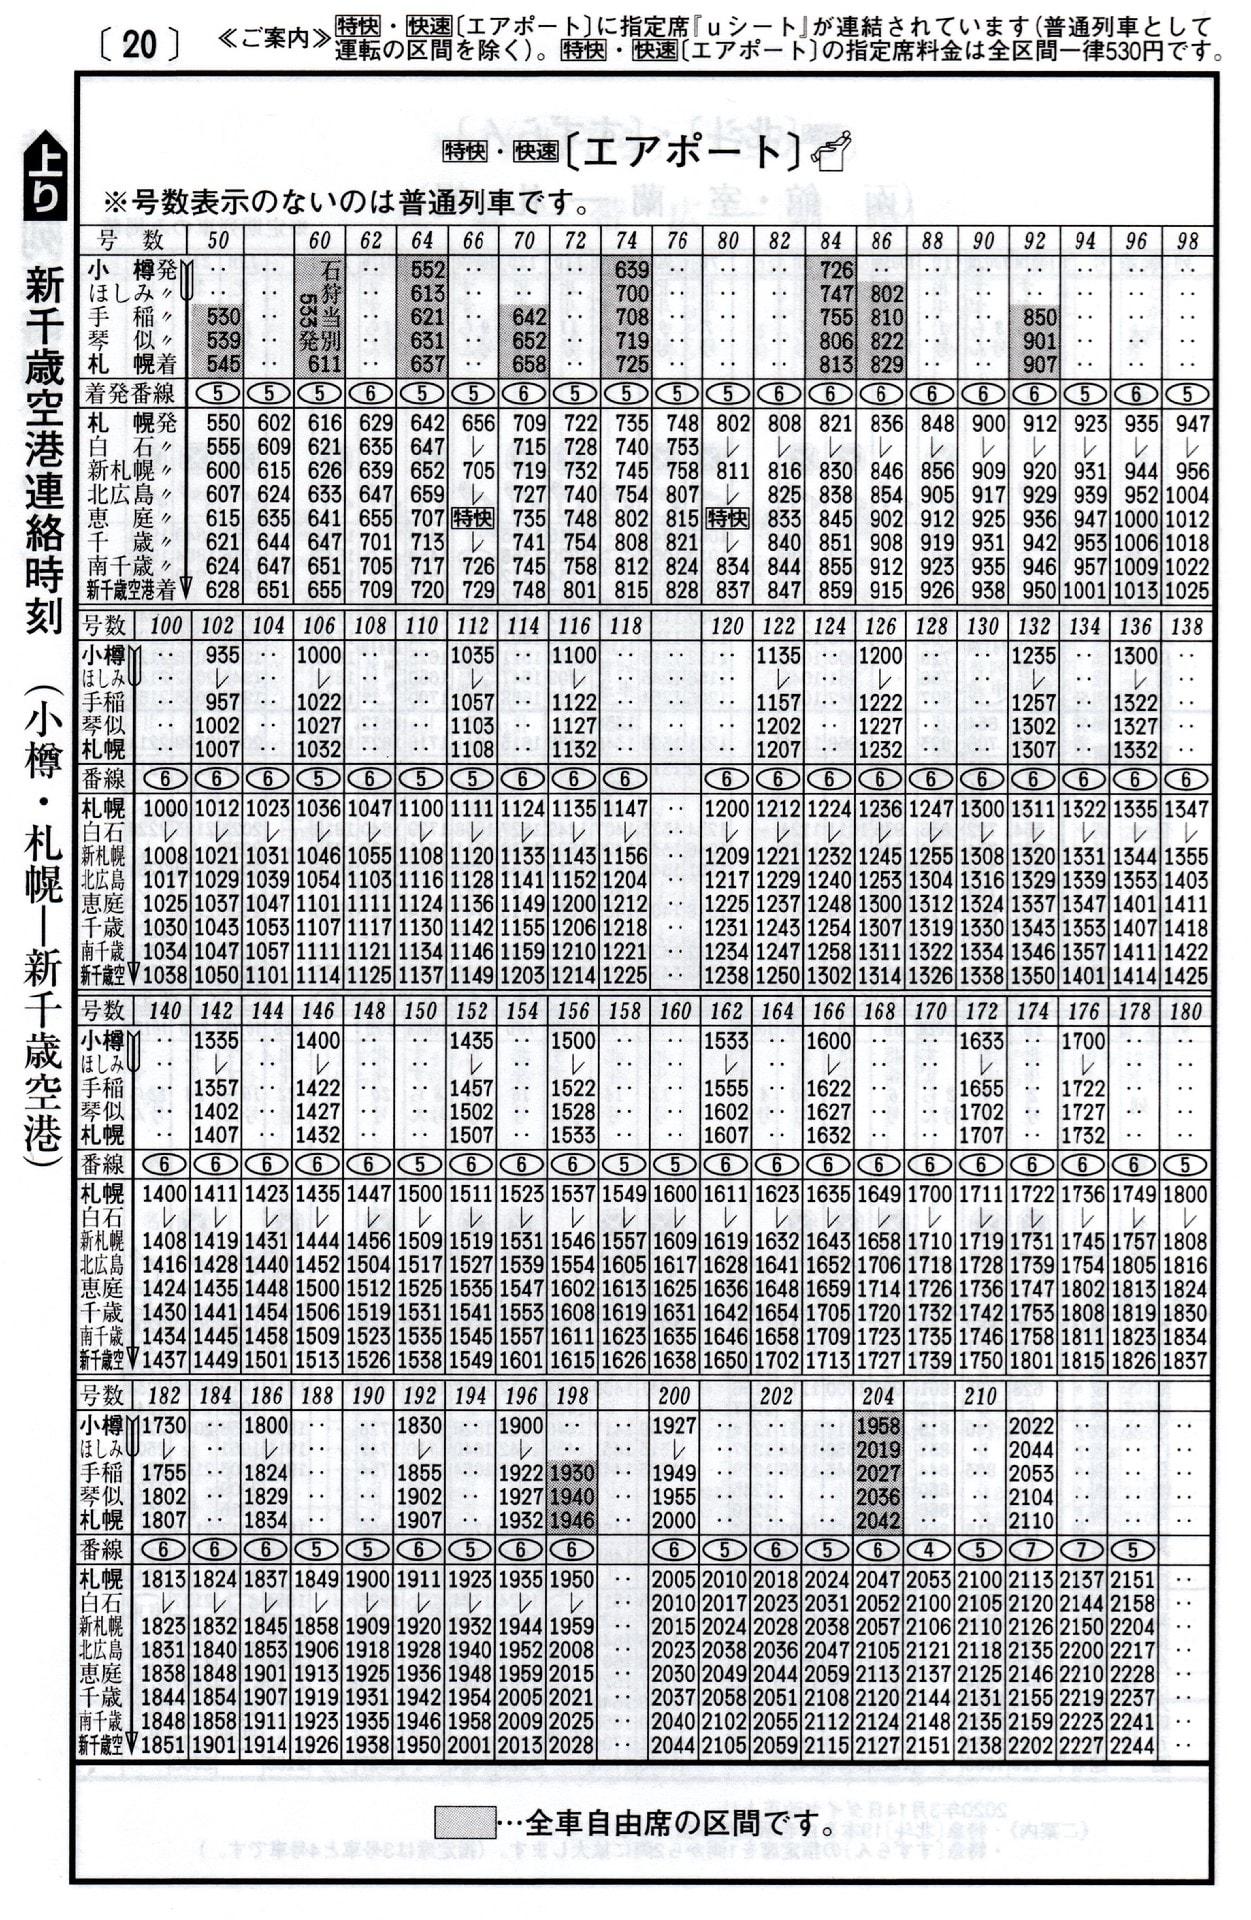 Jr 北海道 時刻 表 JR北海道の時刻表/路線図/定期代 - 駅探